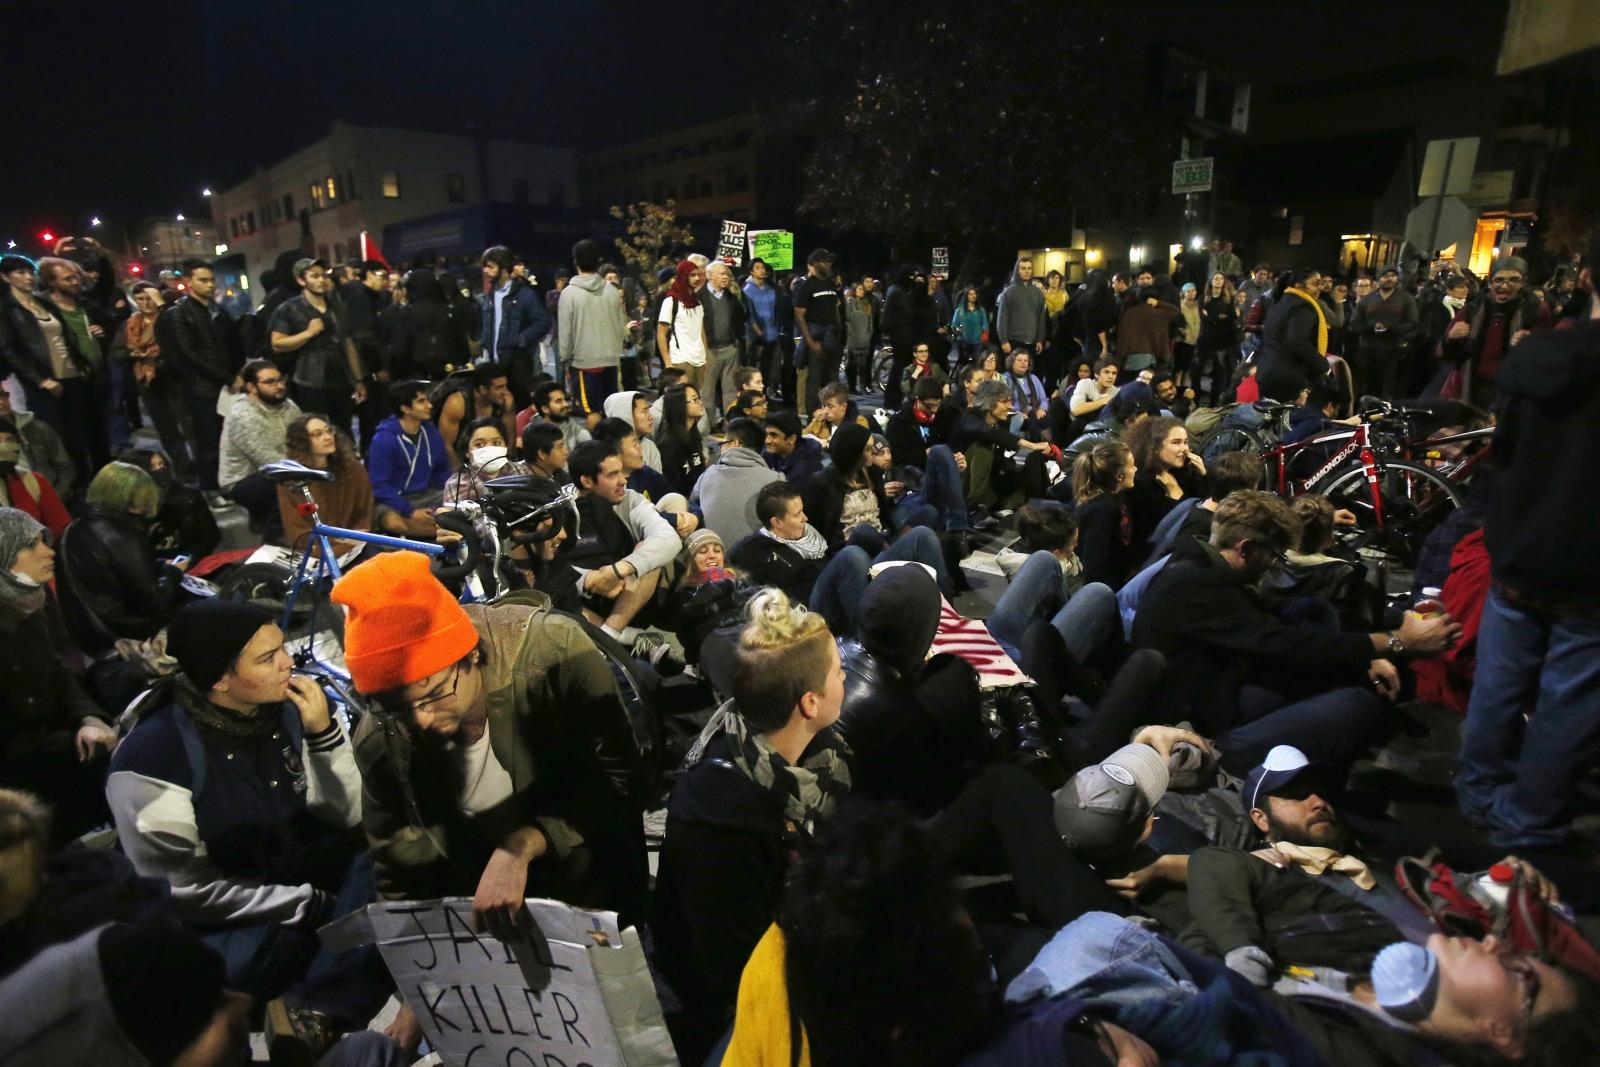 Eric Garner Death: Berkeley Protesters clash with Police